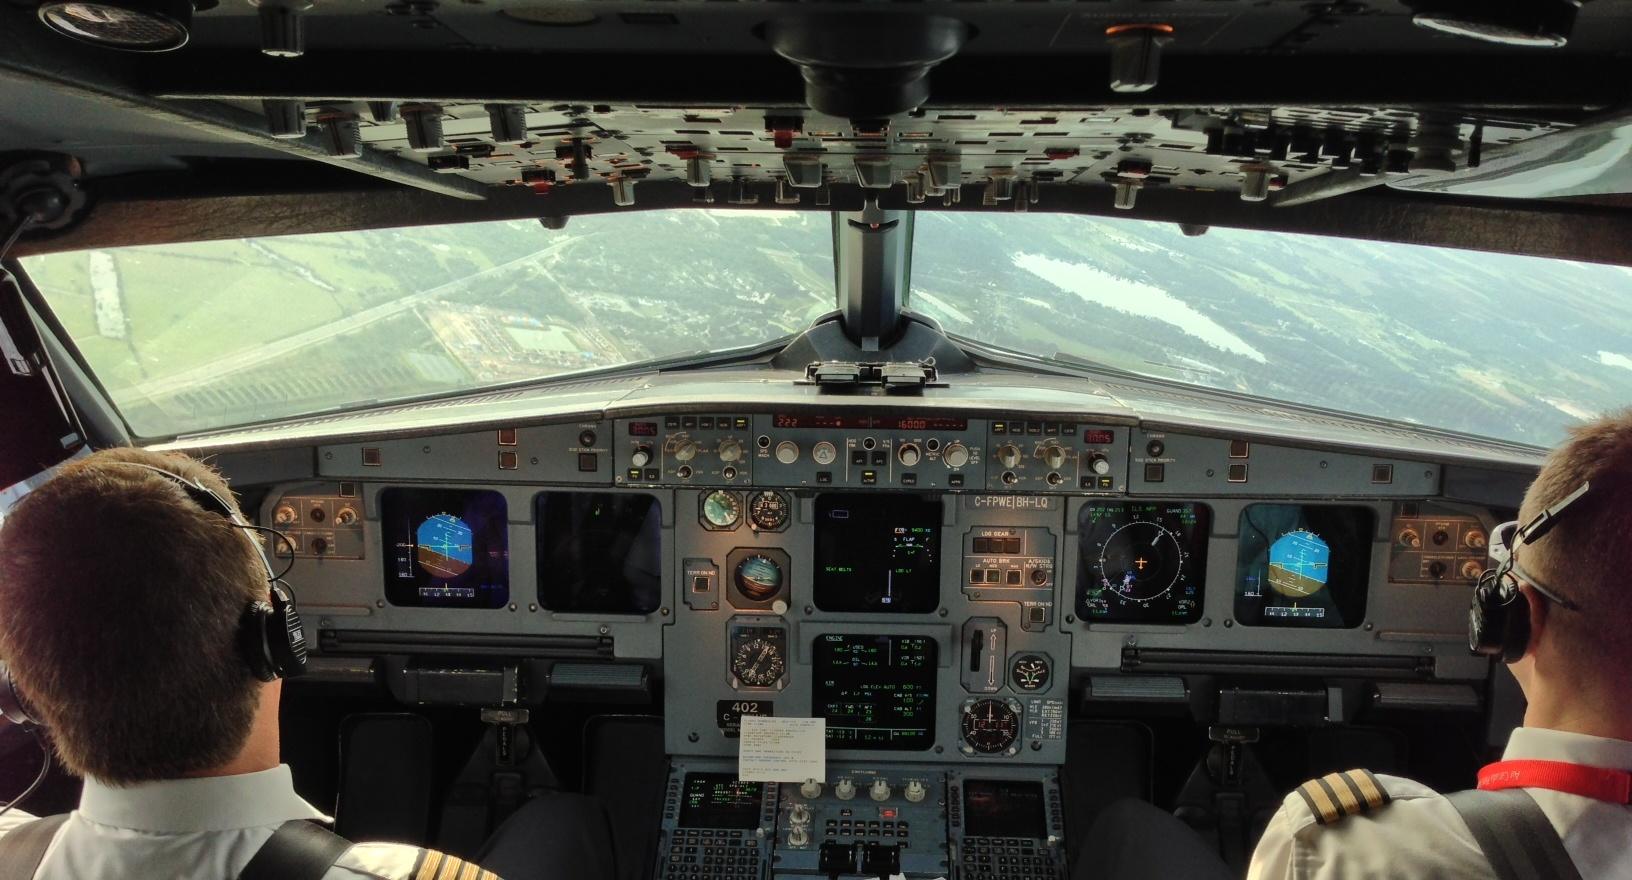 Air Canada Pilot Association has a new Chair, Capt. Kevin Valiant